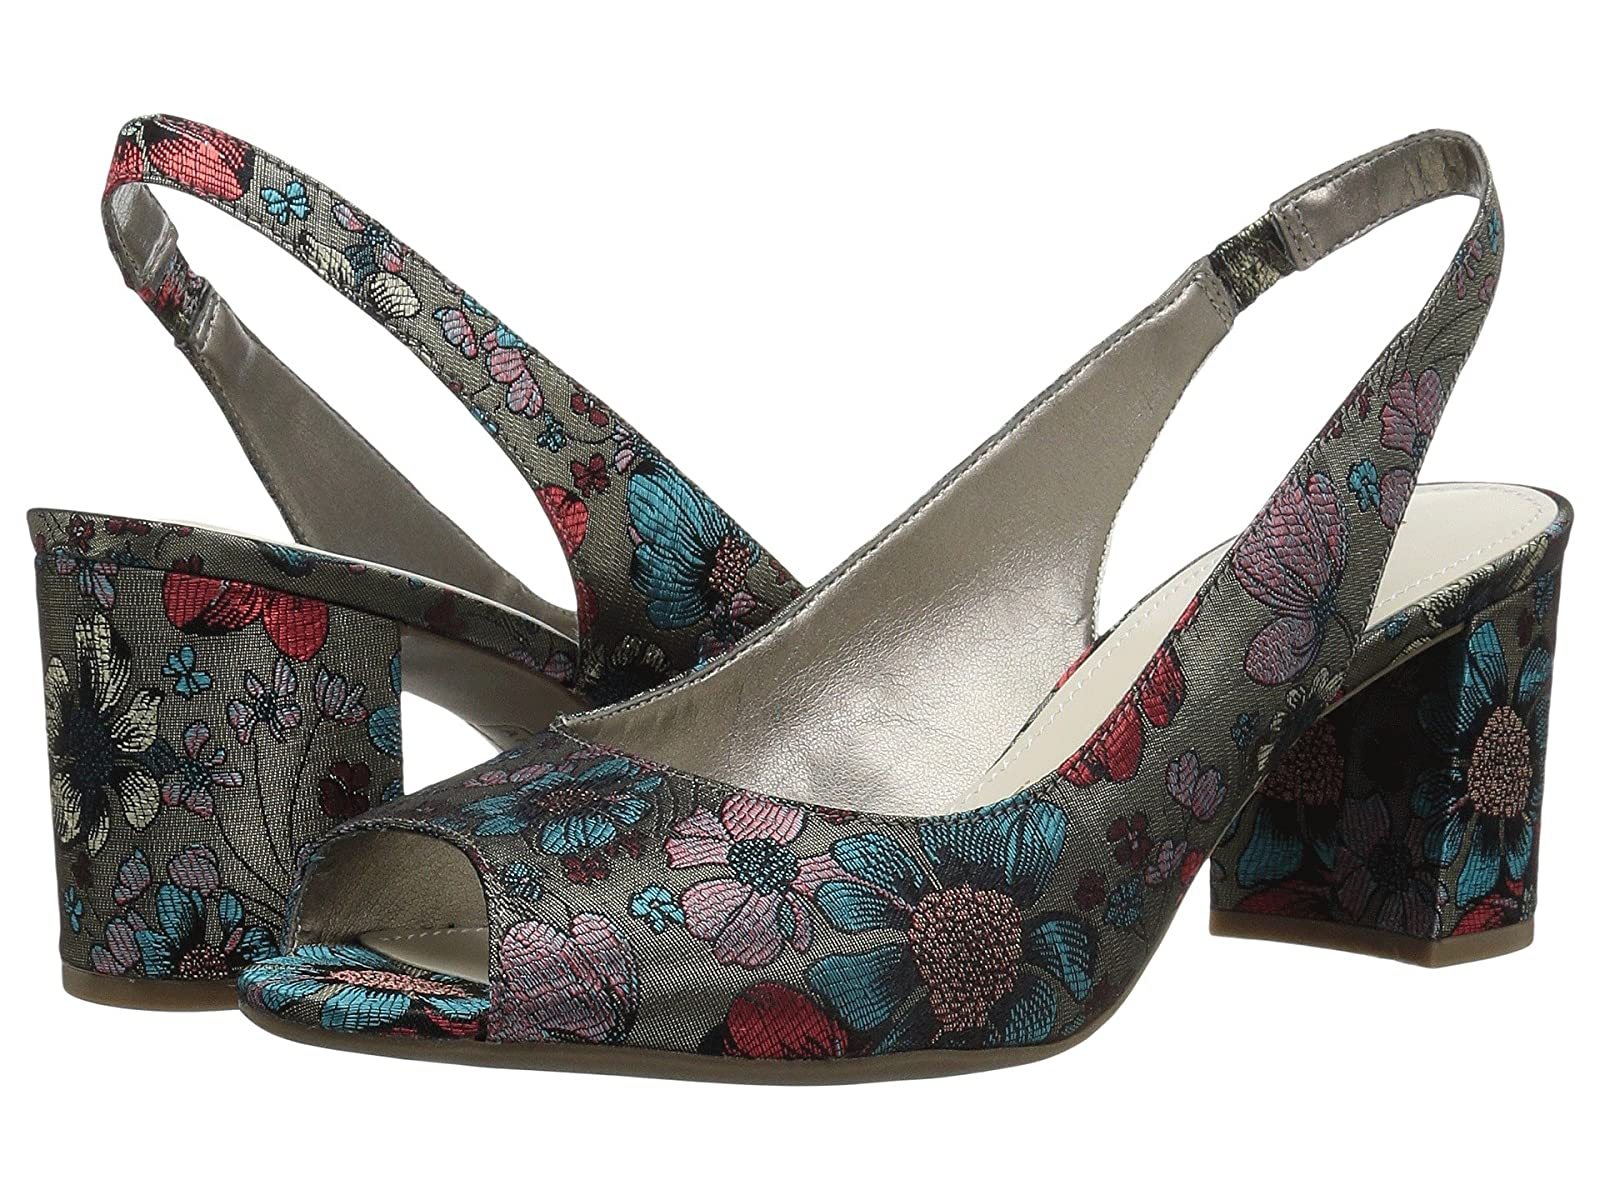 Anne Klein MauriseAtmospheric grades have affordable shoes